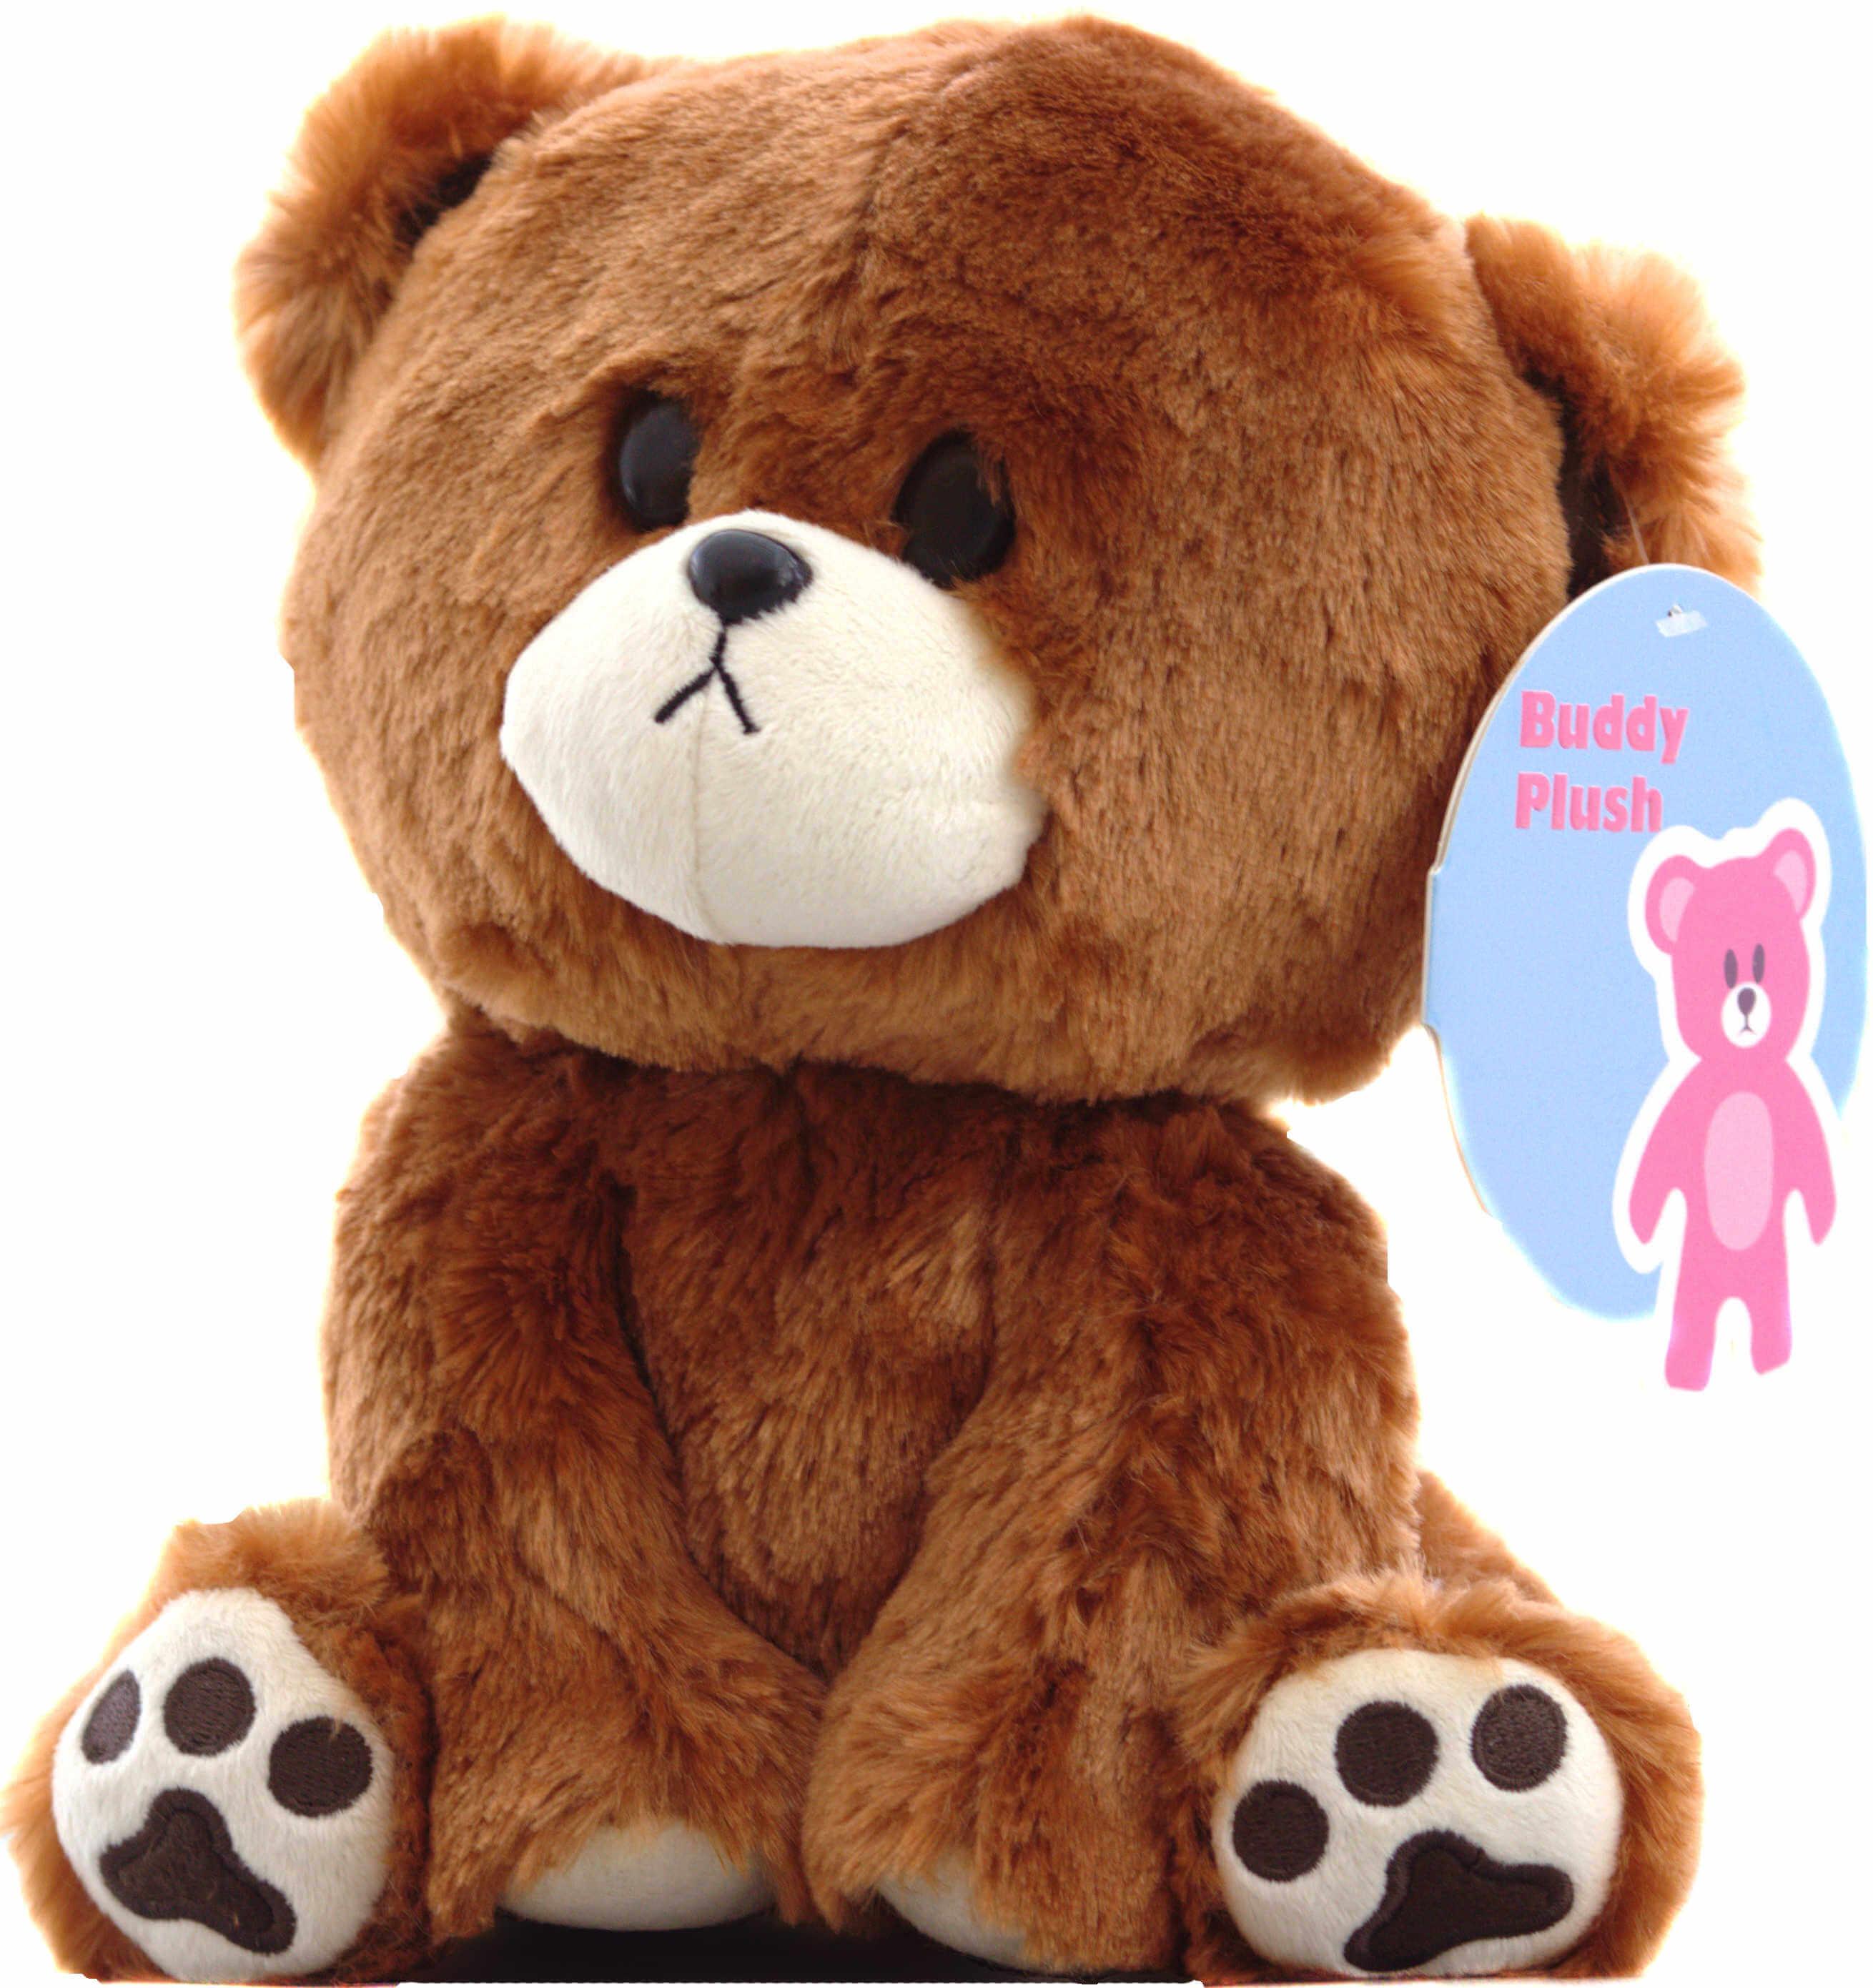 Buddy the curious Teddy Bear Stuffed Animal 9″ Plush – Buddy Plush